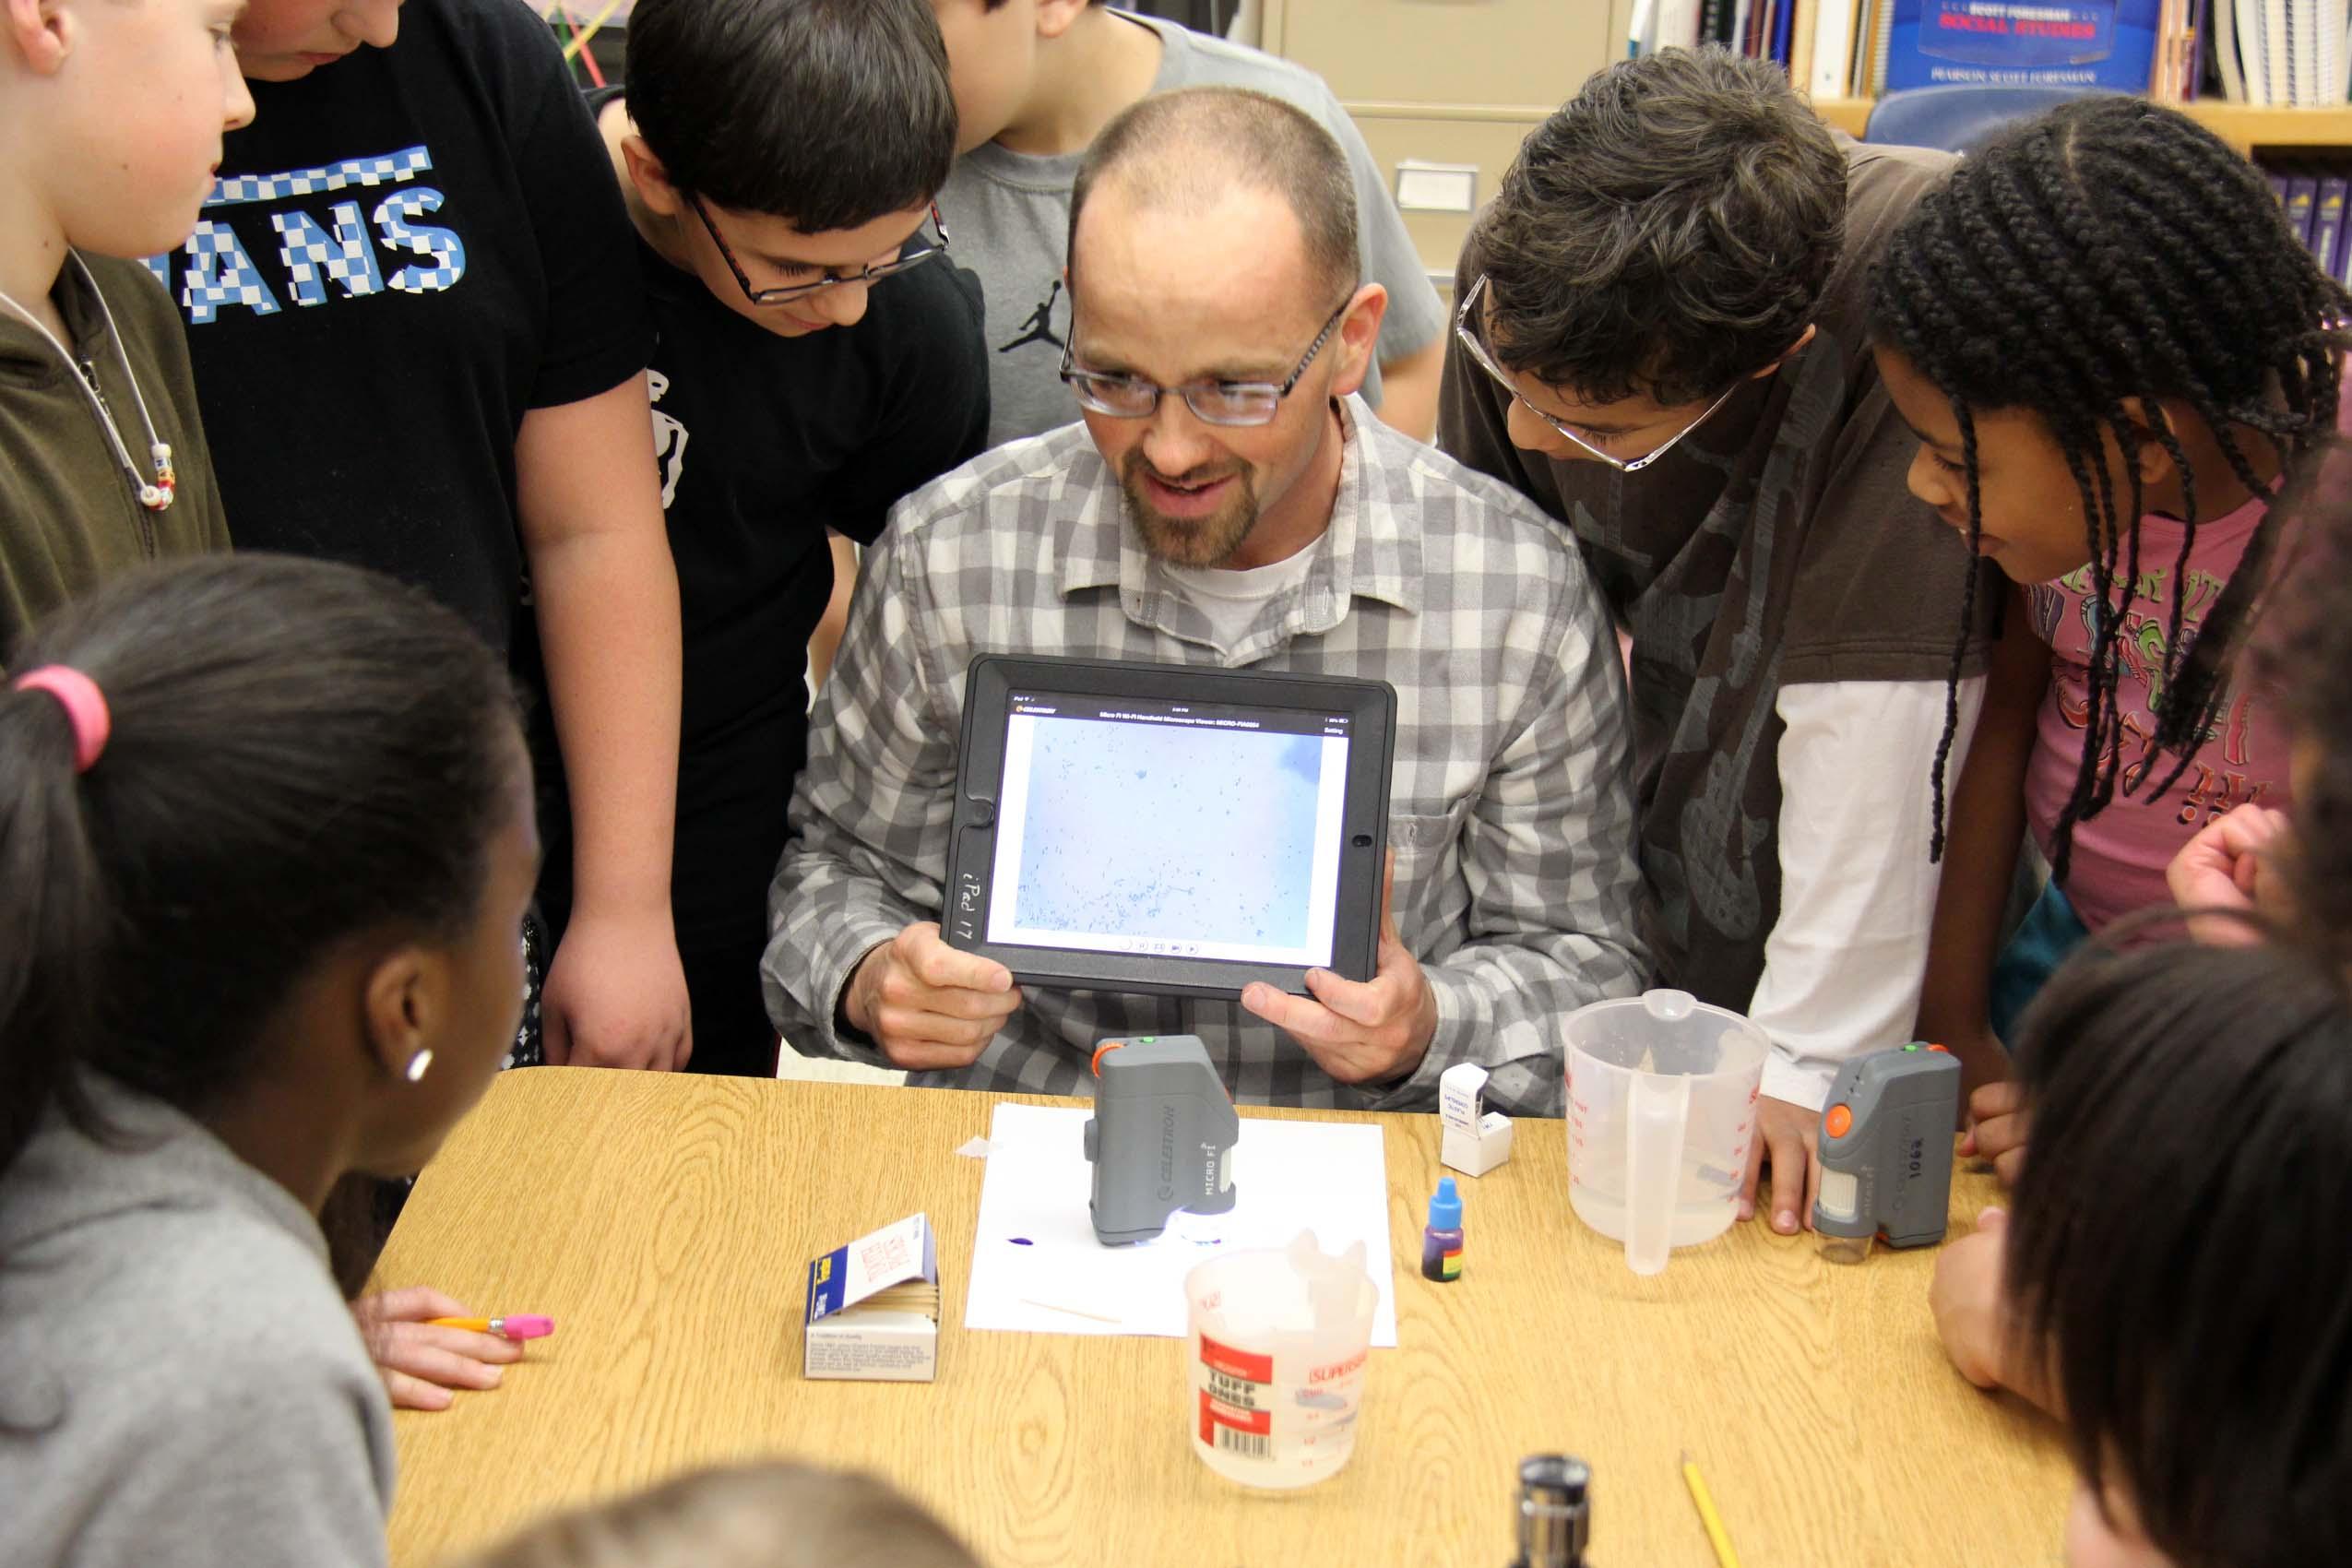 Fifth-graders view their teacher's cells through an iPad display.